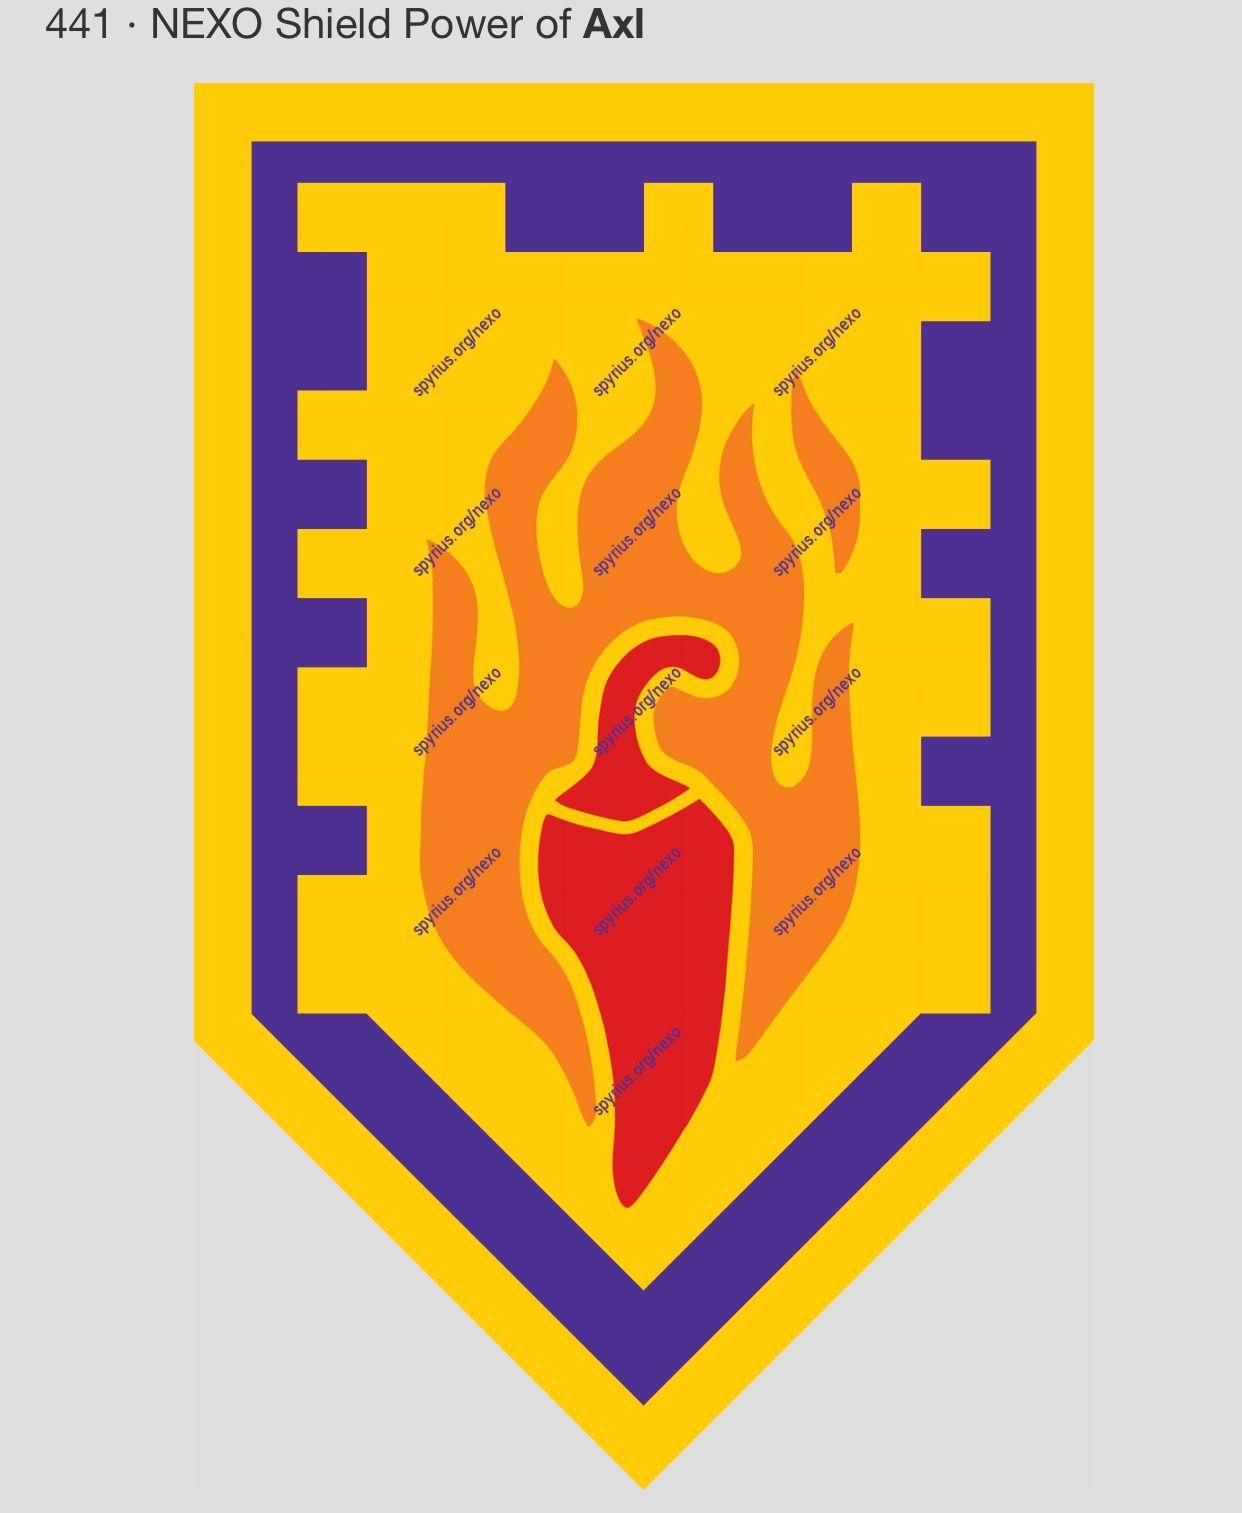 Pin By Vanessa Kooij On Nexo Powers Nexo Knights Shields Chili Con Carne Knight